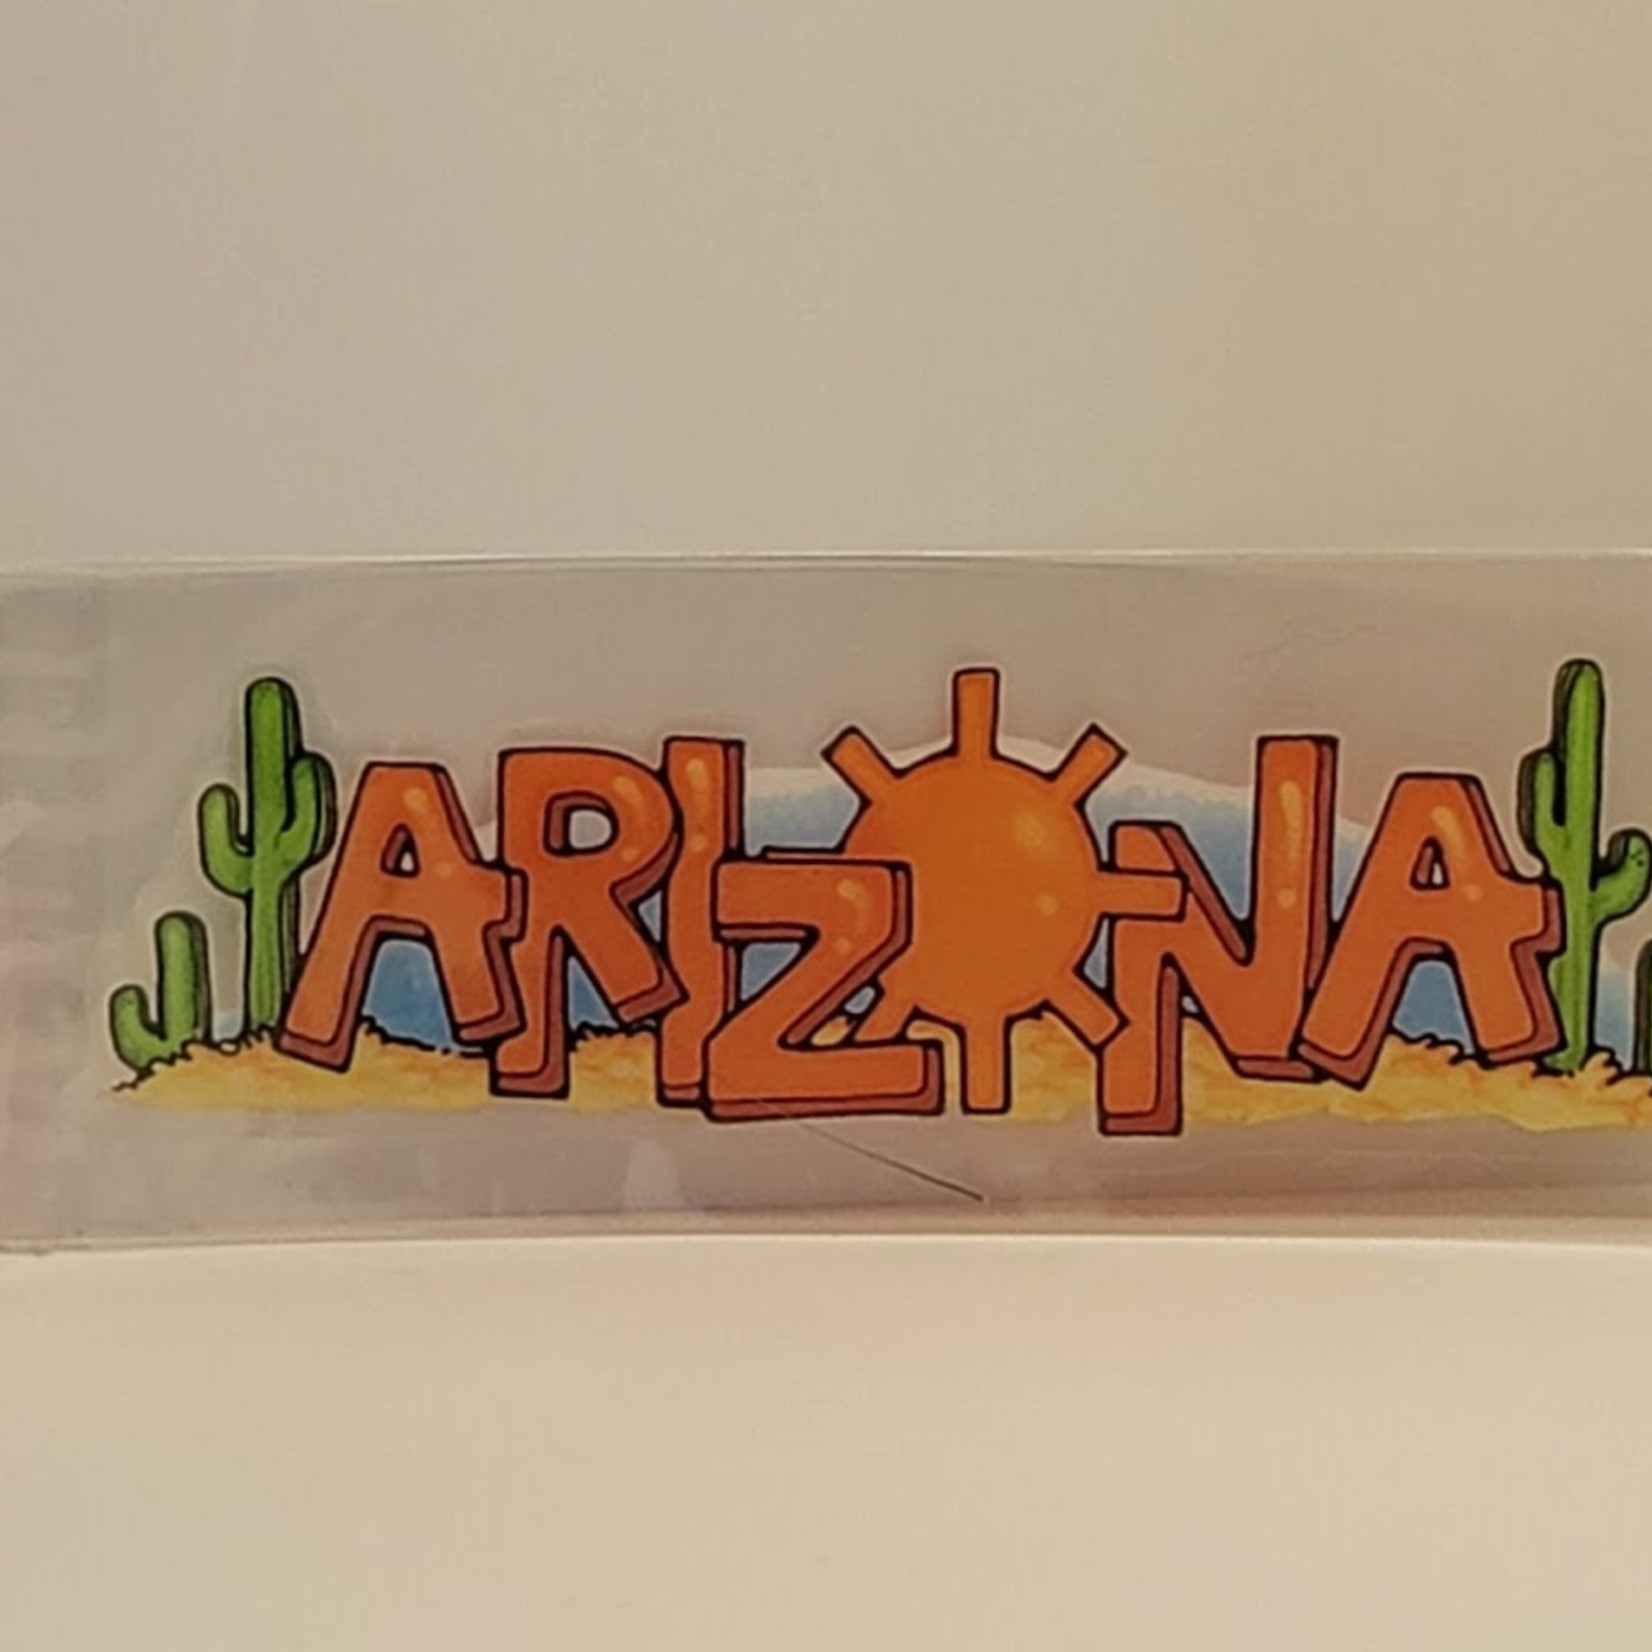 Heading Sticker - Arizona